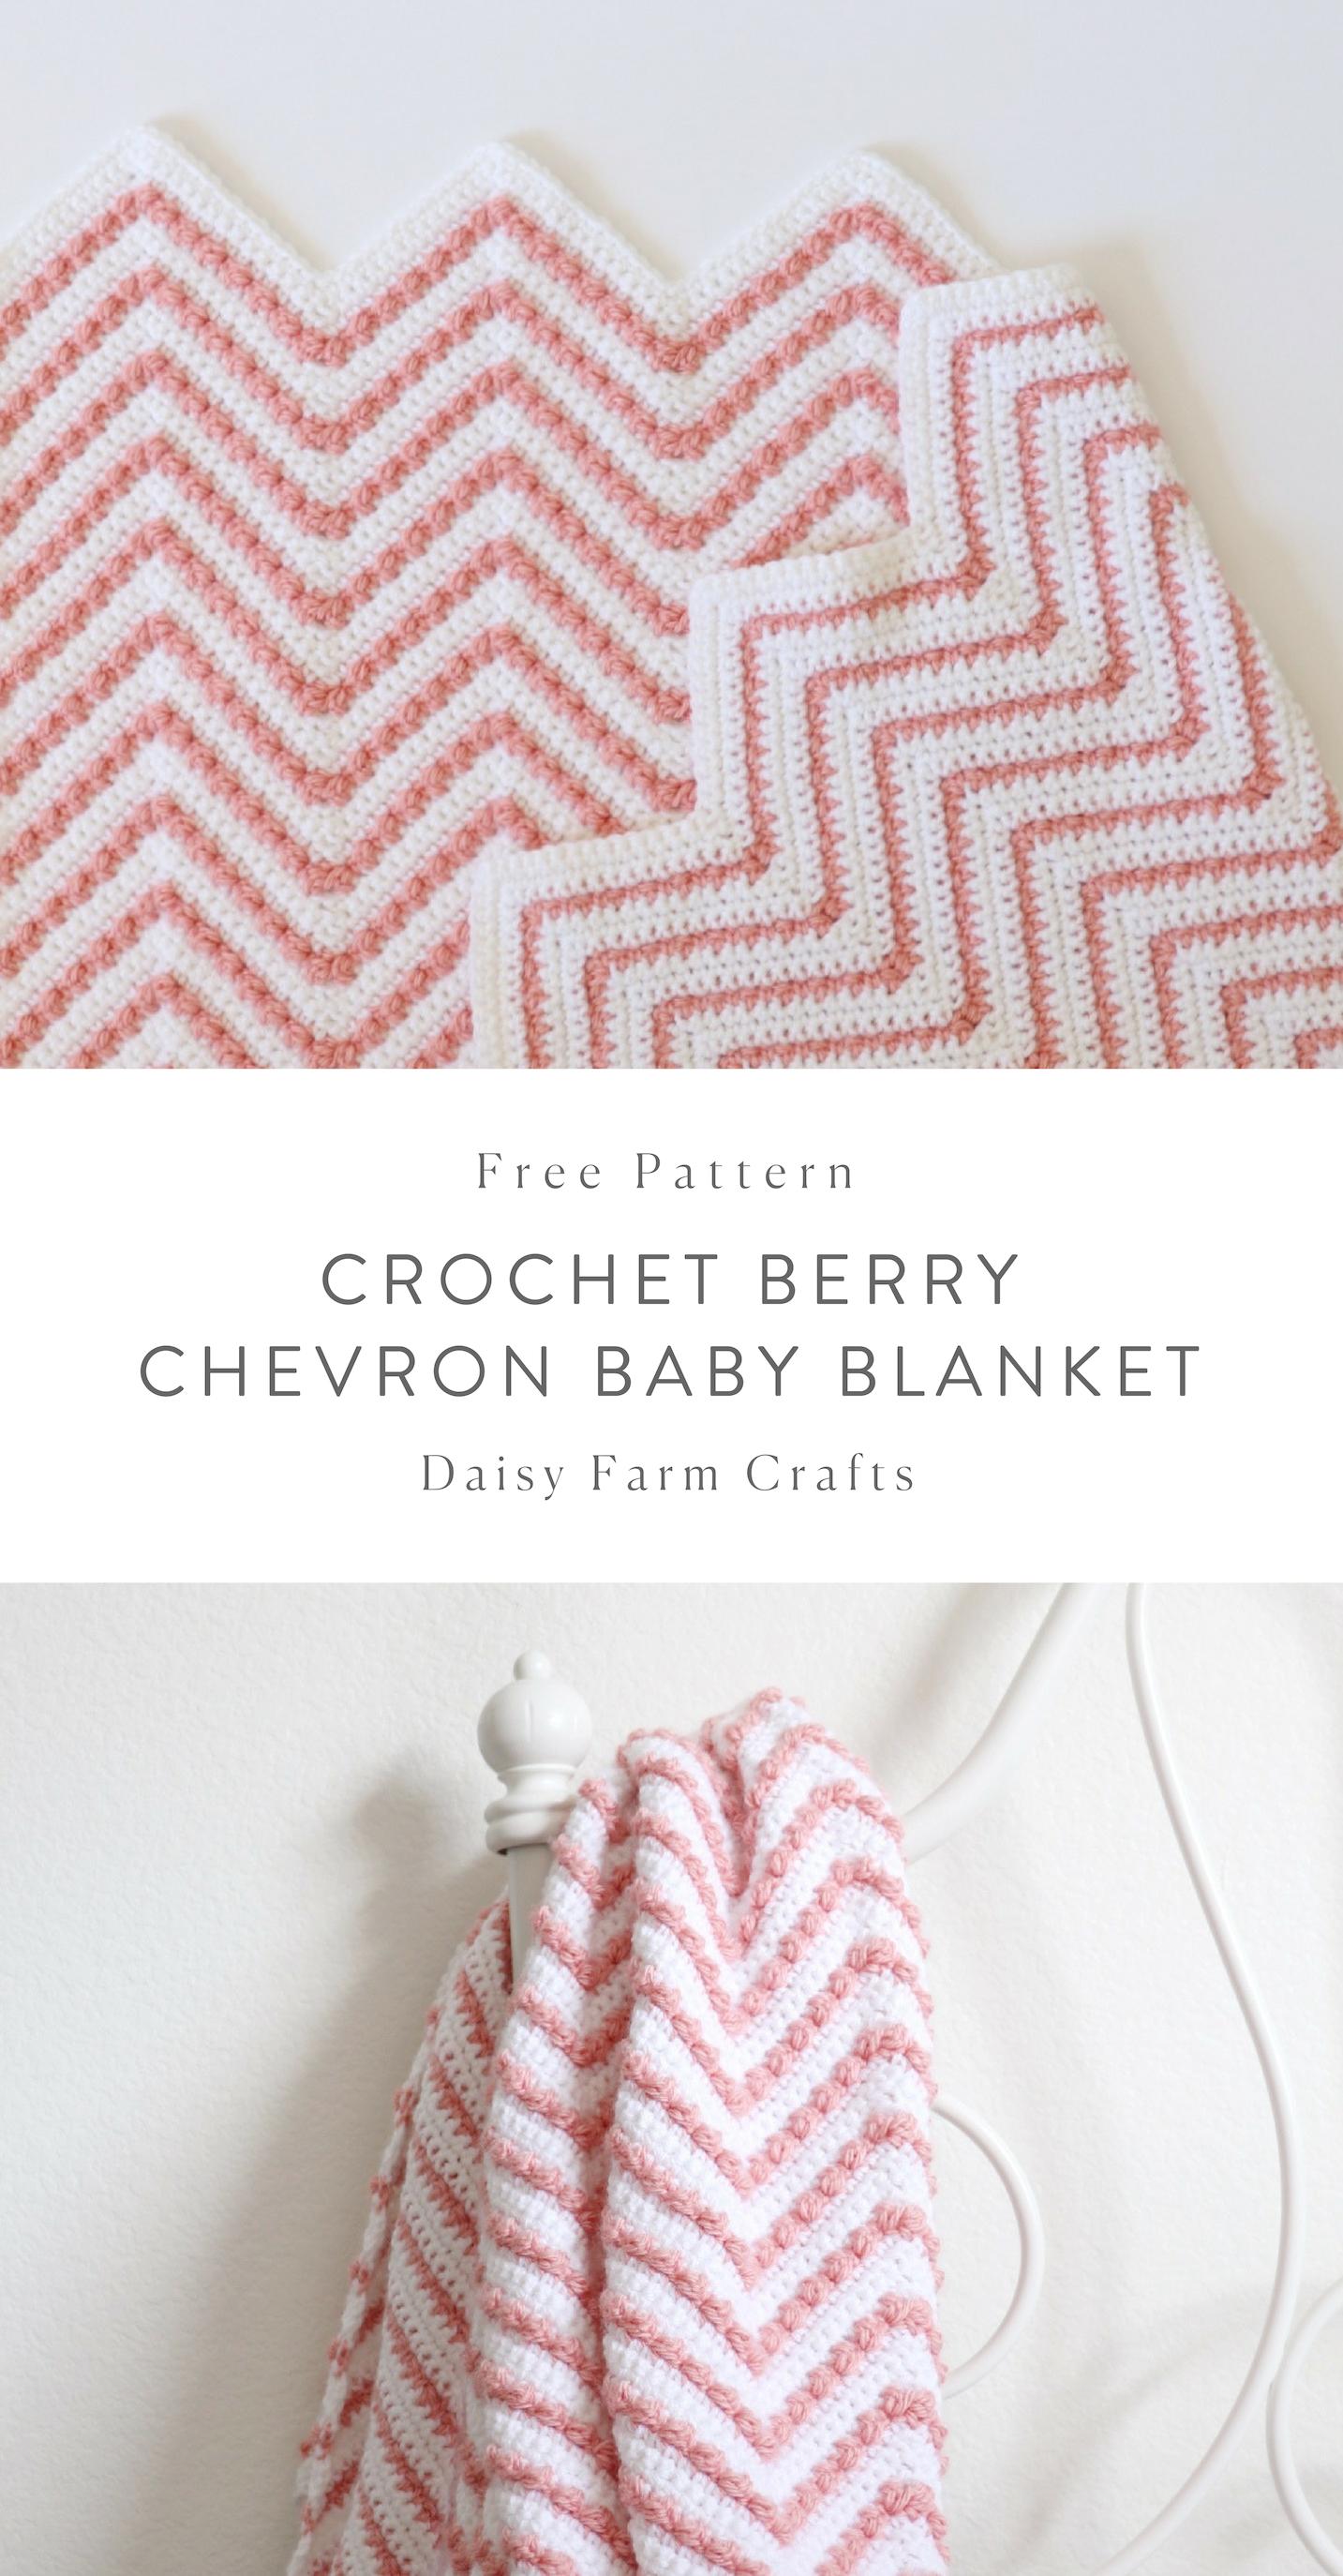 Free Pattern - Crochet Berry Chevron Baby Blanket | Free Crochet ...